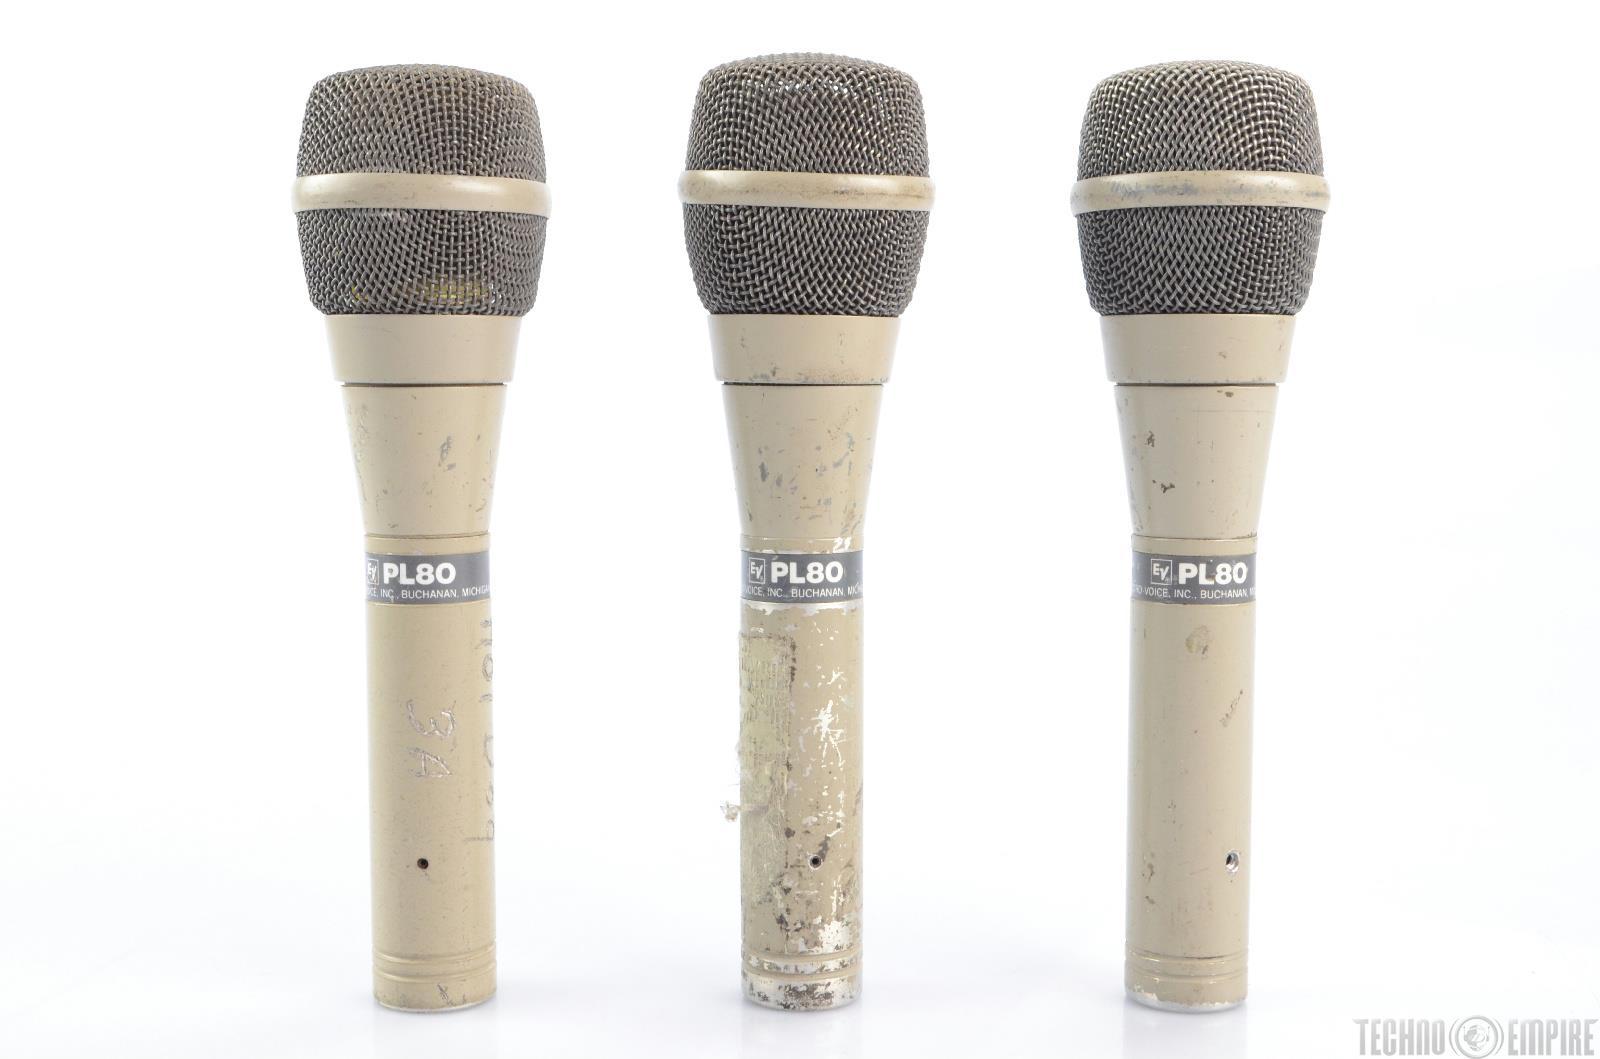 3 electro voice ev pl80 dynamic super cardioid microphones 22567 ebay. Black Bedroom Furniture Sets. Home Design Ideas